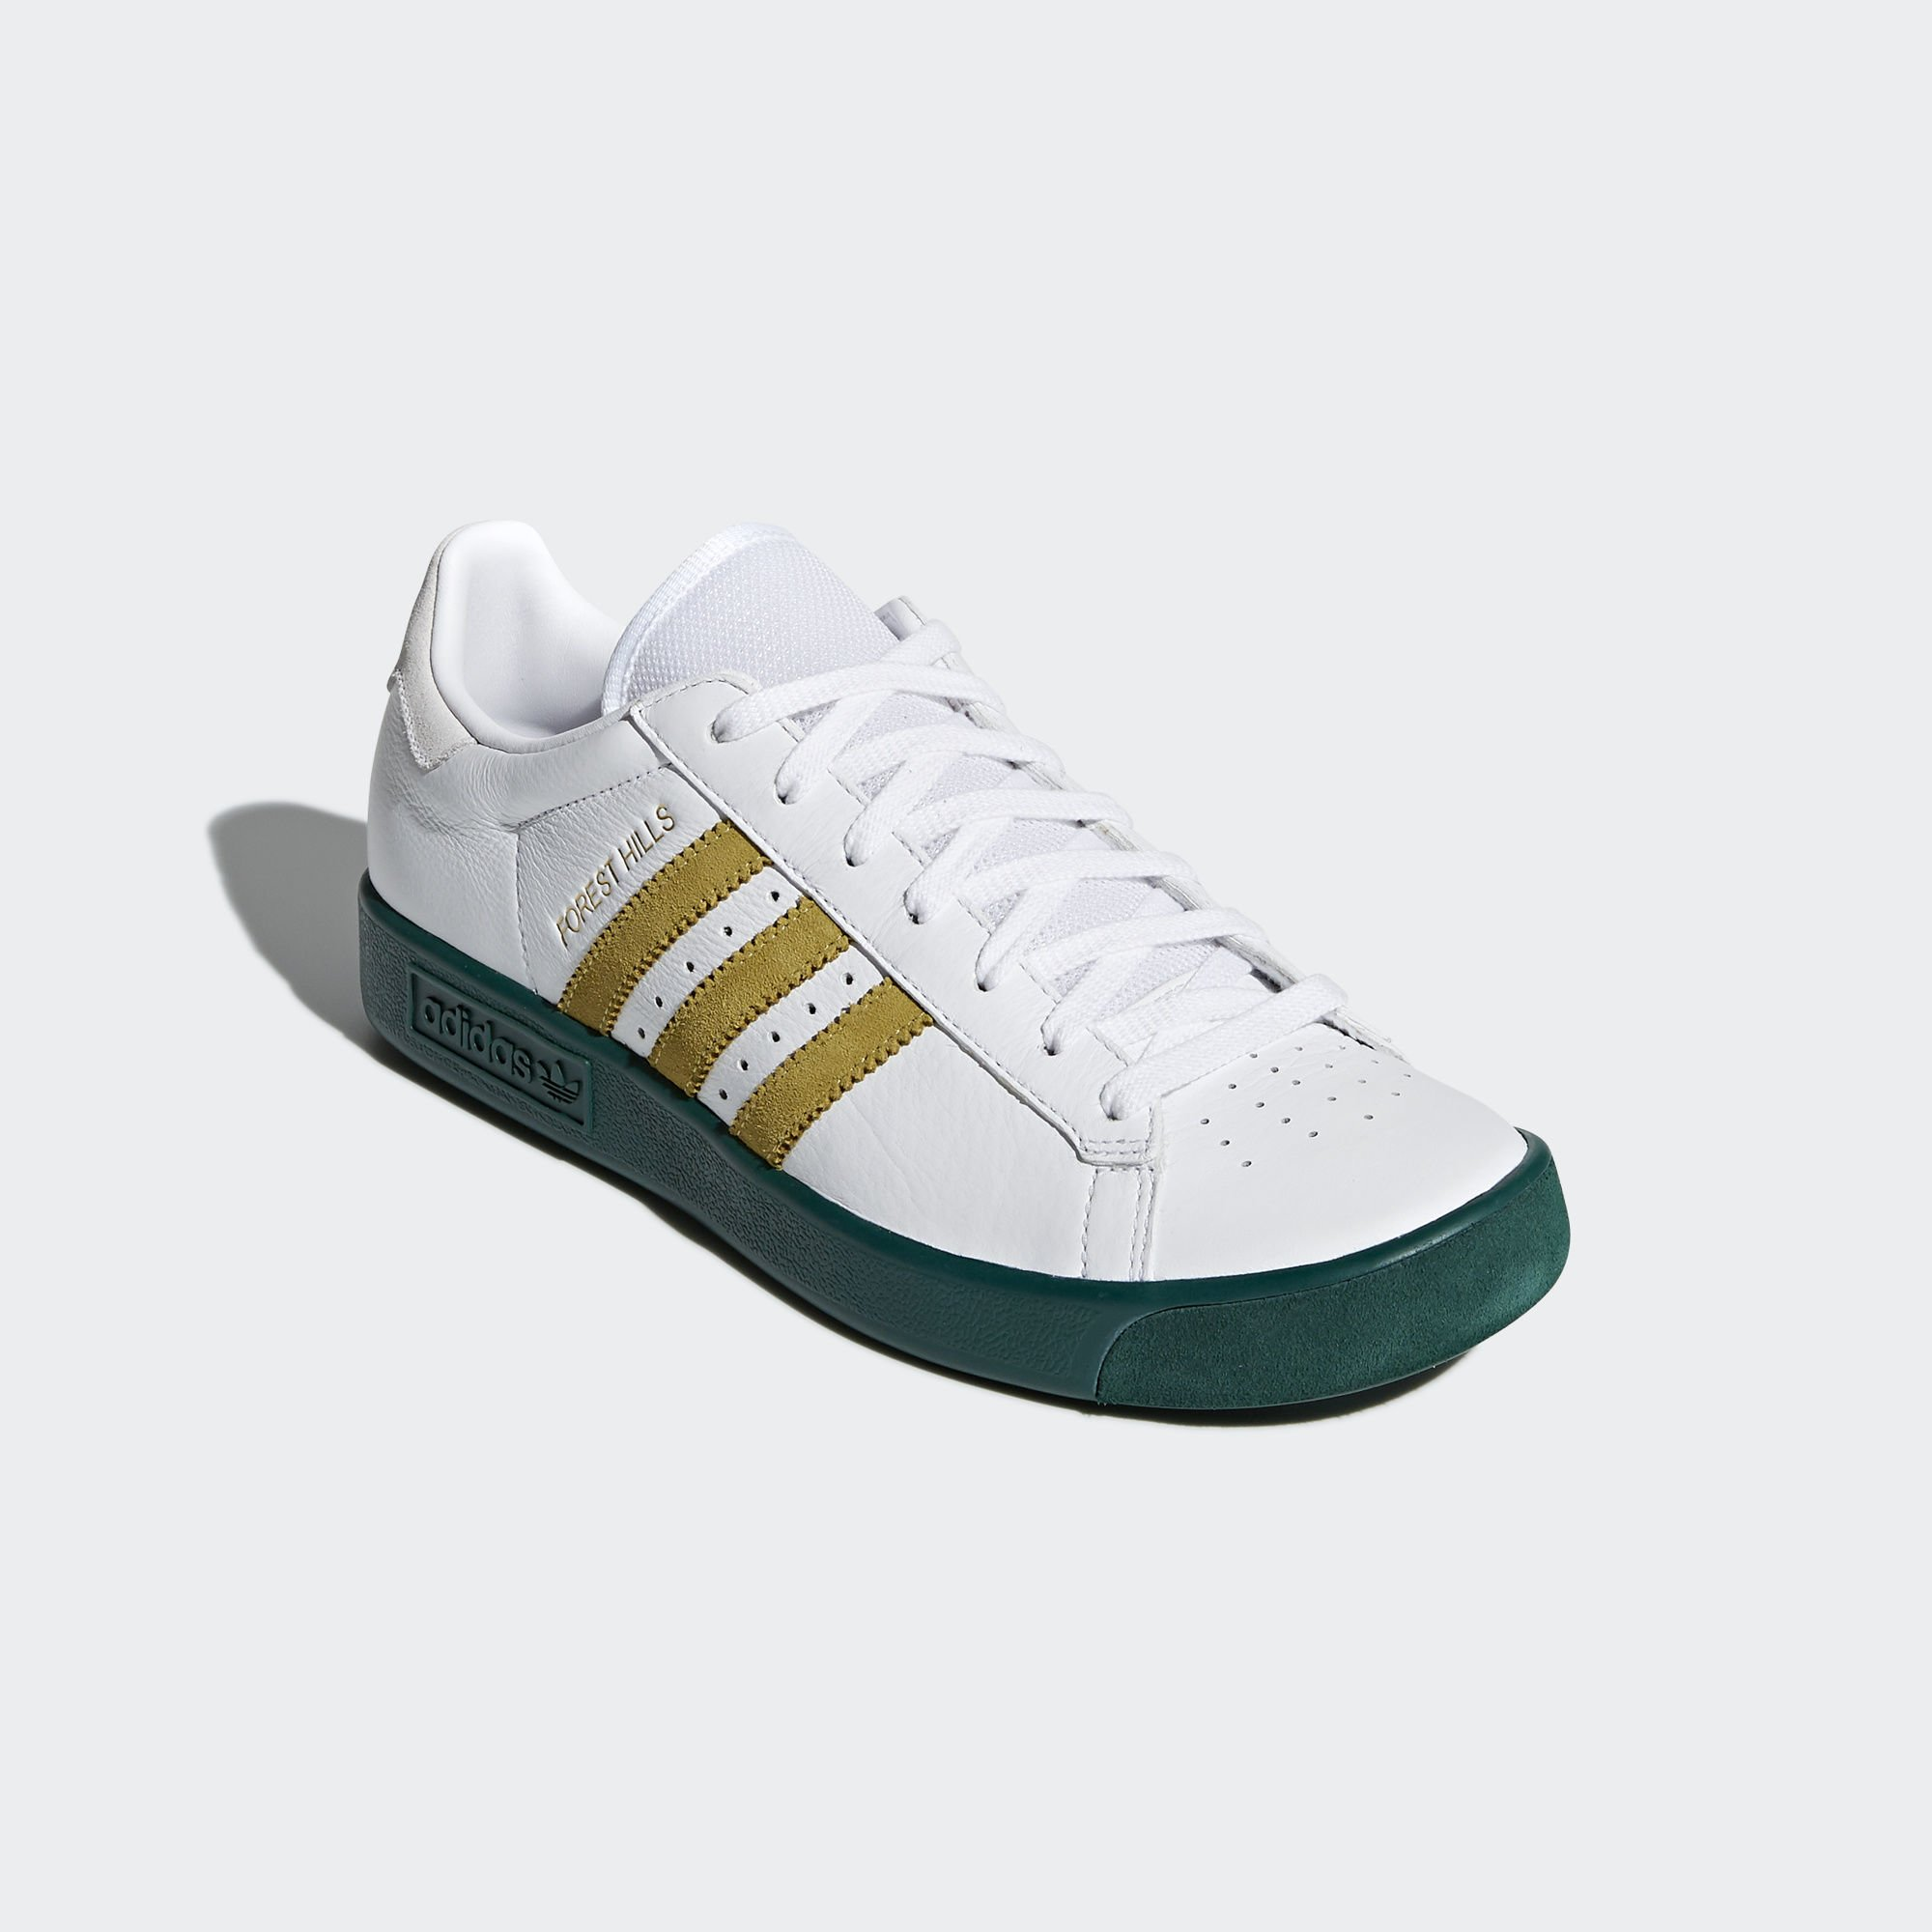 adidas Forest Hill 'Green/Gold' (AQ0921)